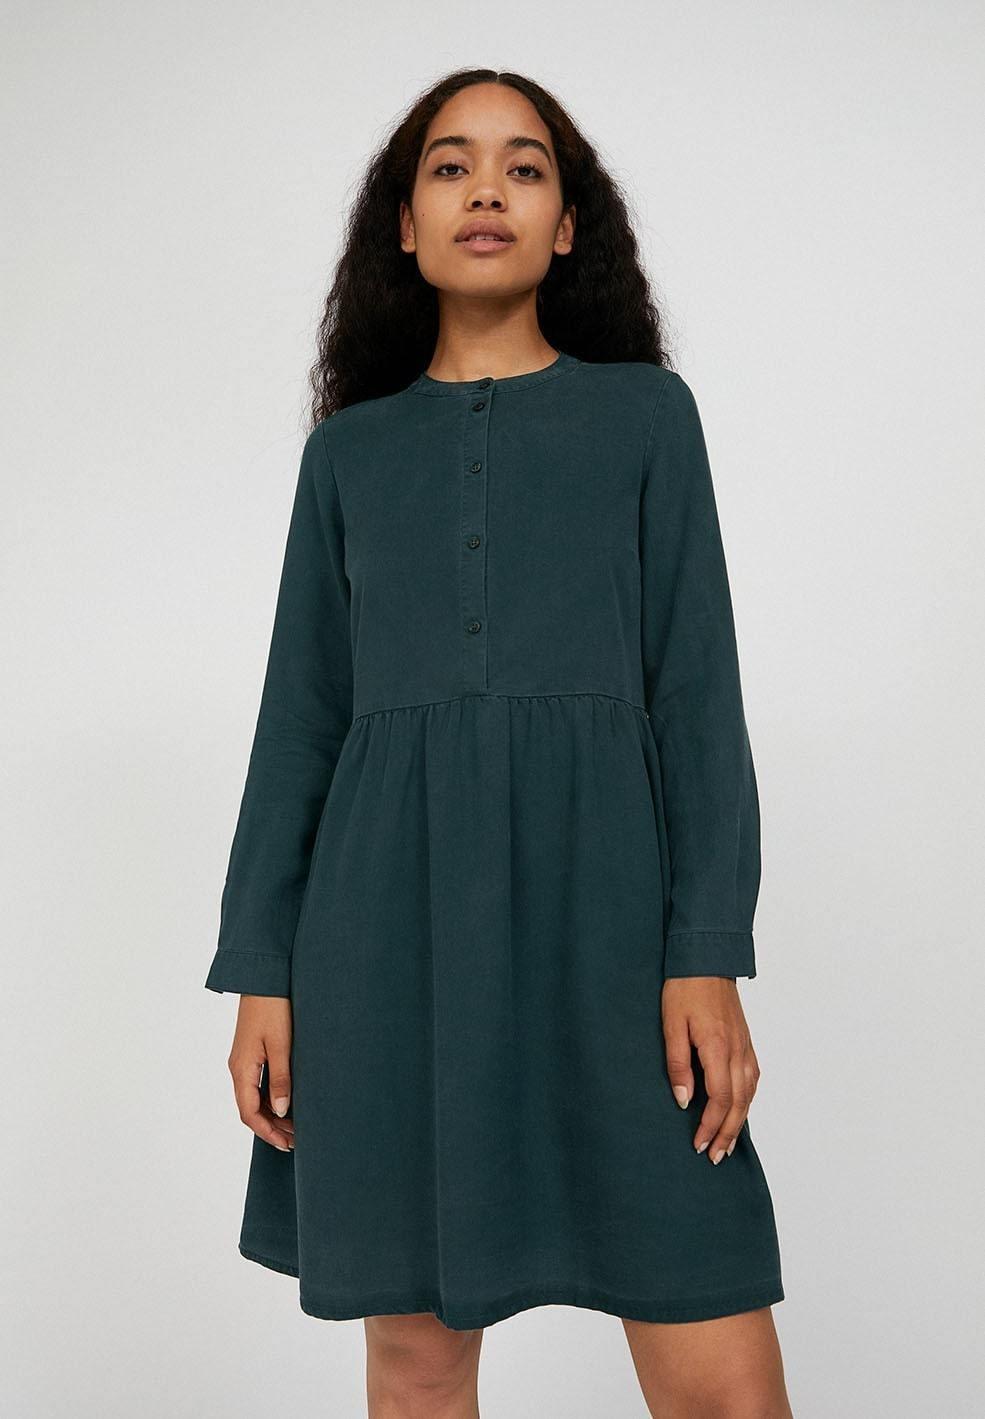 Robe Patineuse Vert Bouteille En Tencel Hallaa Armedangels